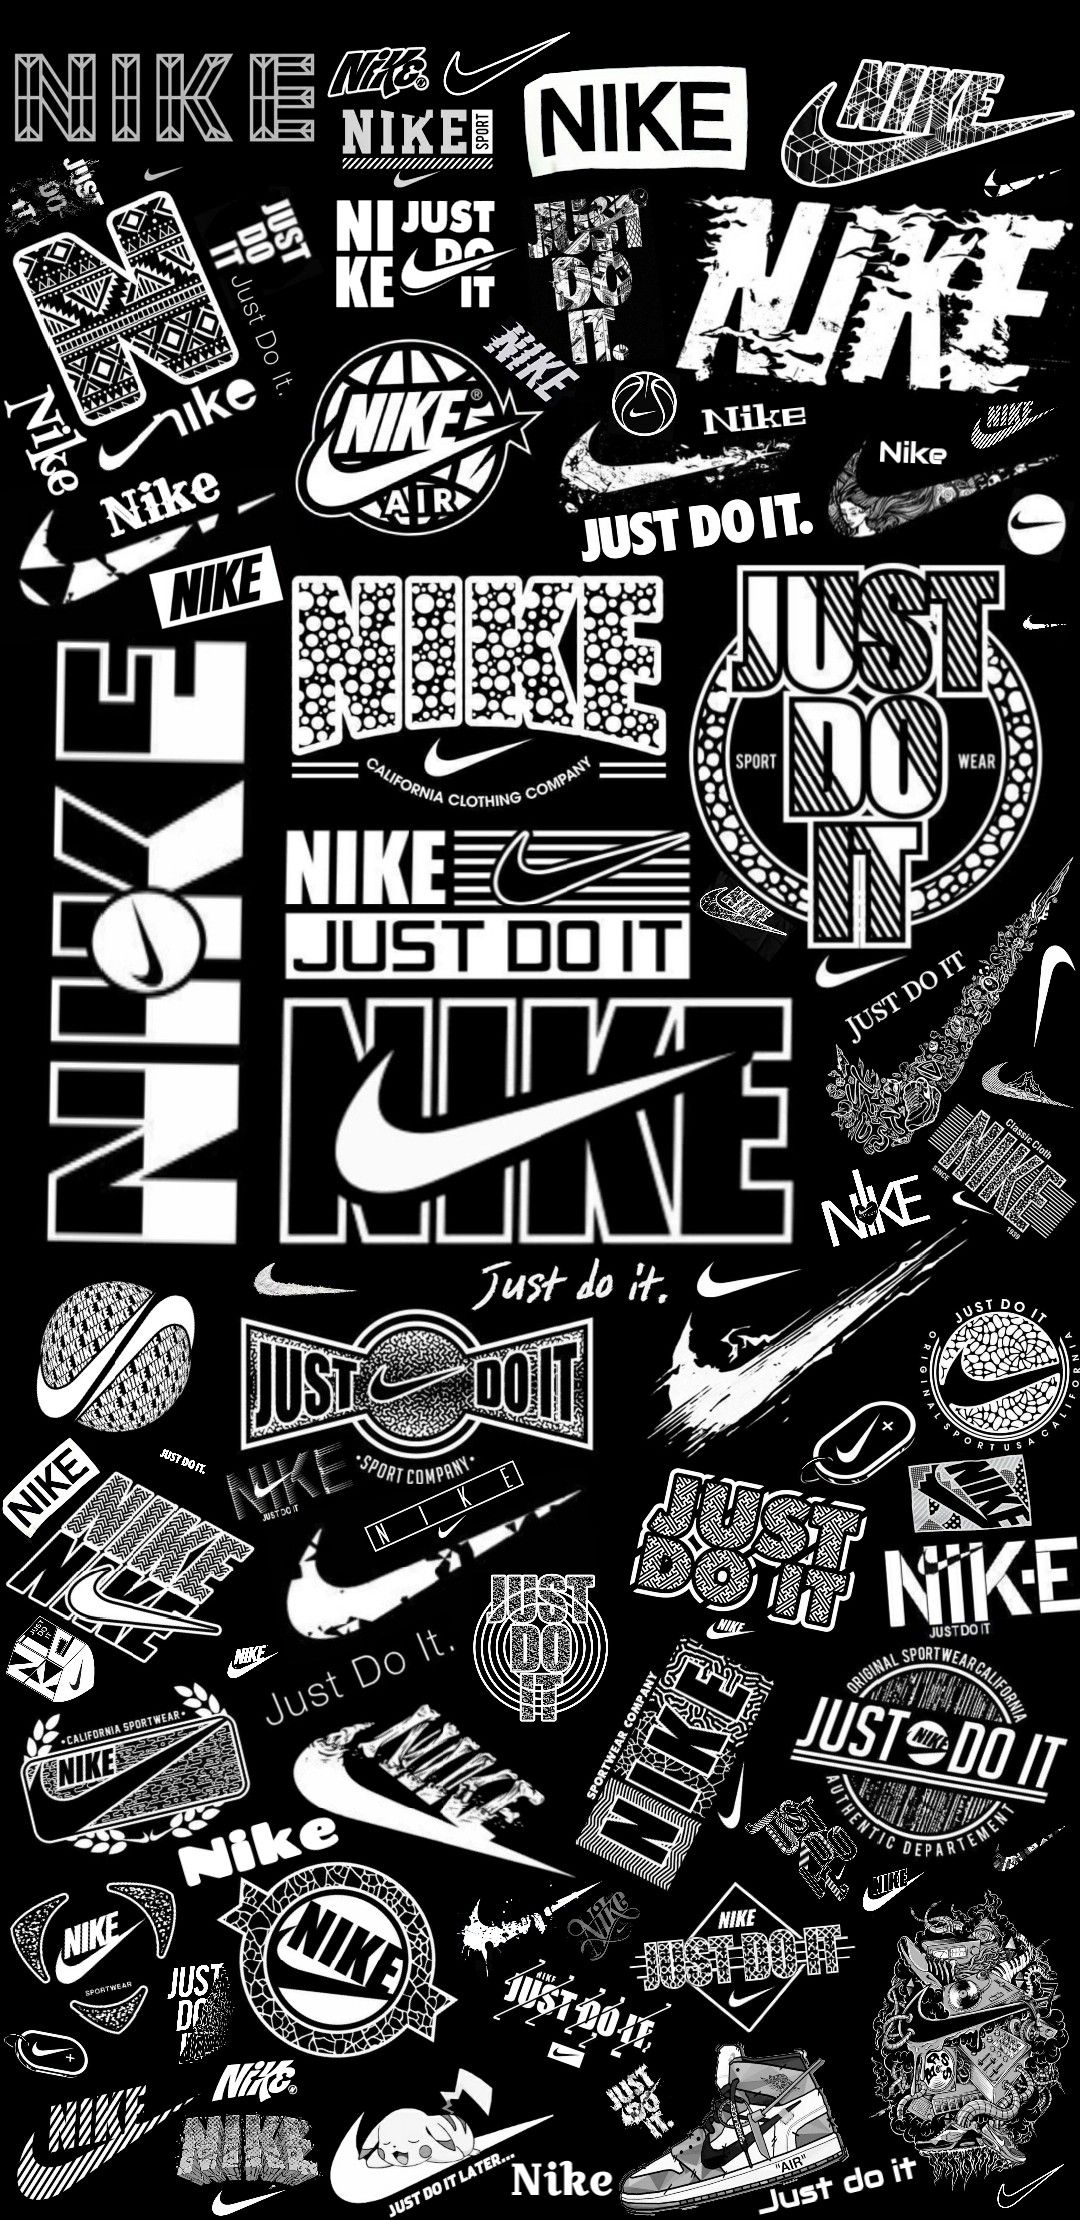 Epingle Par Caronike Sur Nike Wallpapers En 2020 Fond D Ecran Nike Noir Fond D Ecran Colore Fond D Ecran Telephone